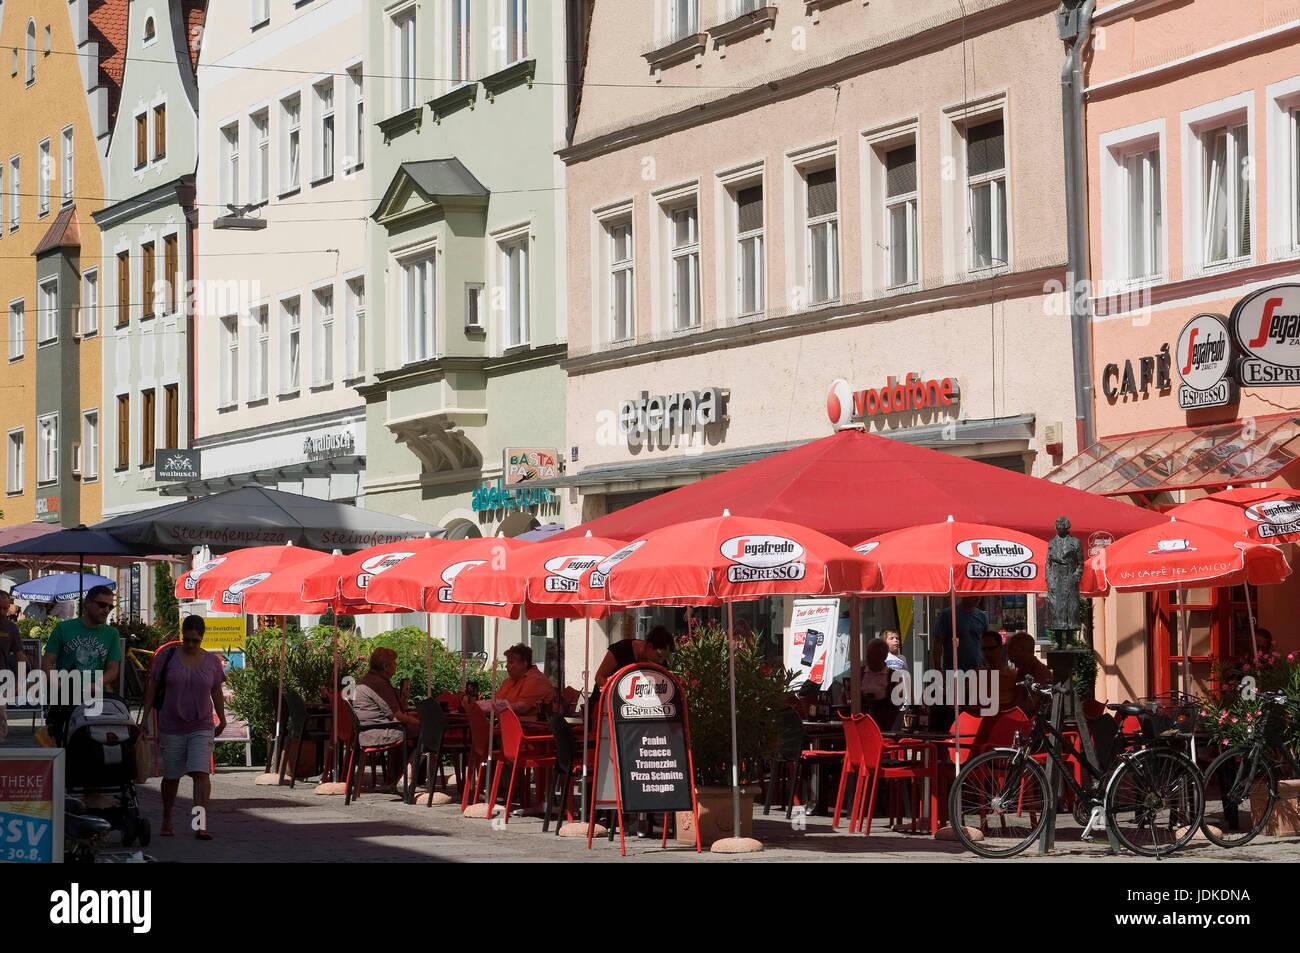 Europe, Germany, Bavaria, Ingolstadt, Theresienstrasse, street cafe, , Europa, Deutschland, Bayern, Theresienstraße, - Stock Image